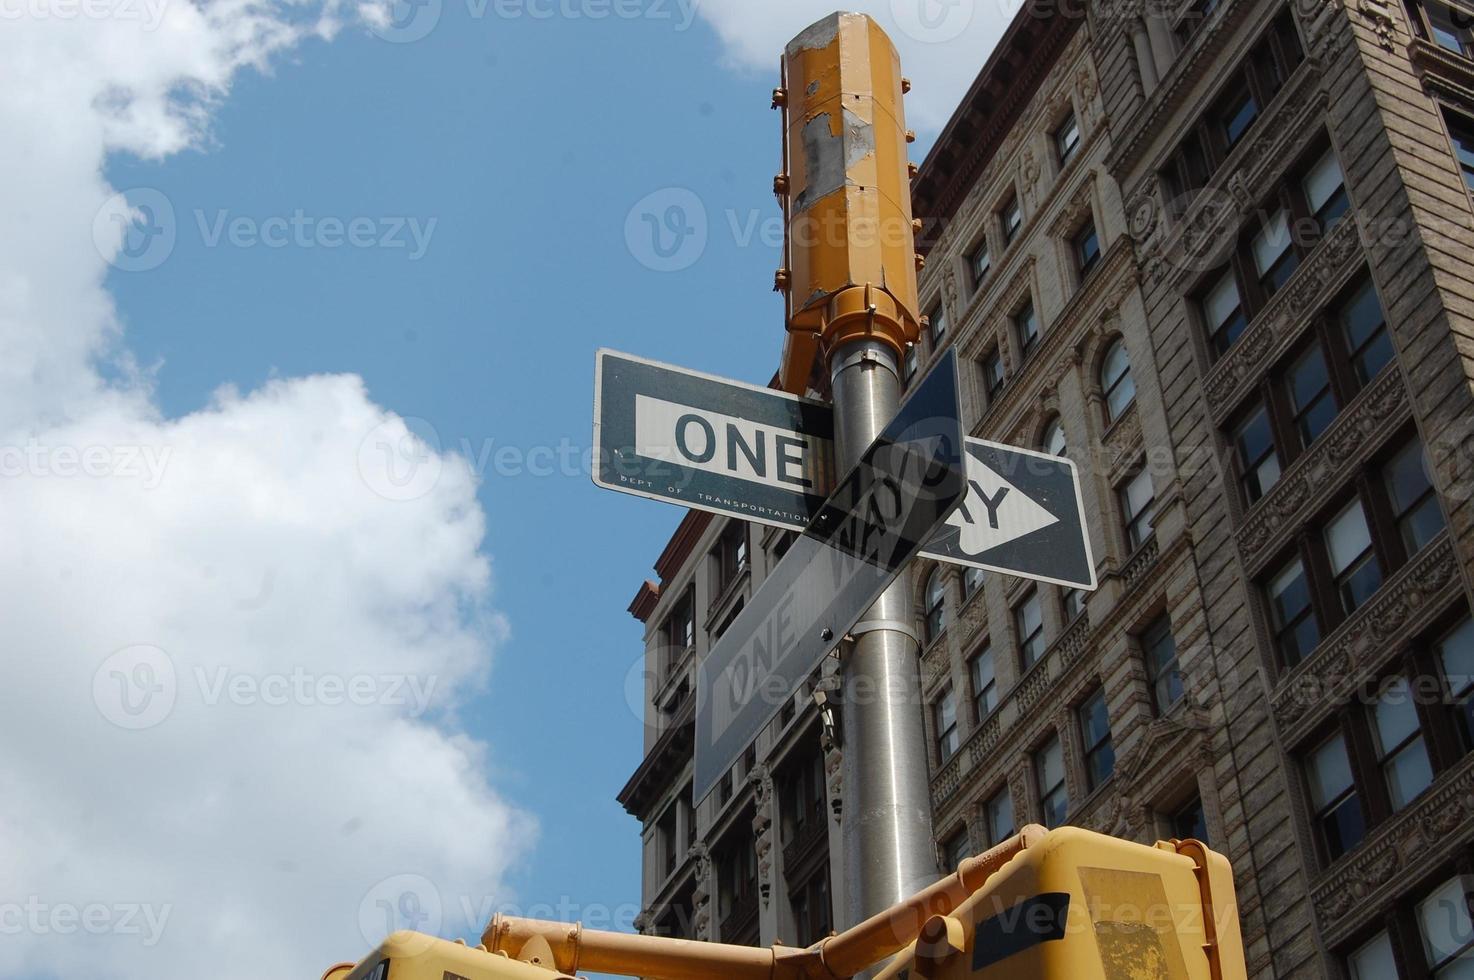 One Way Back photo